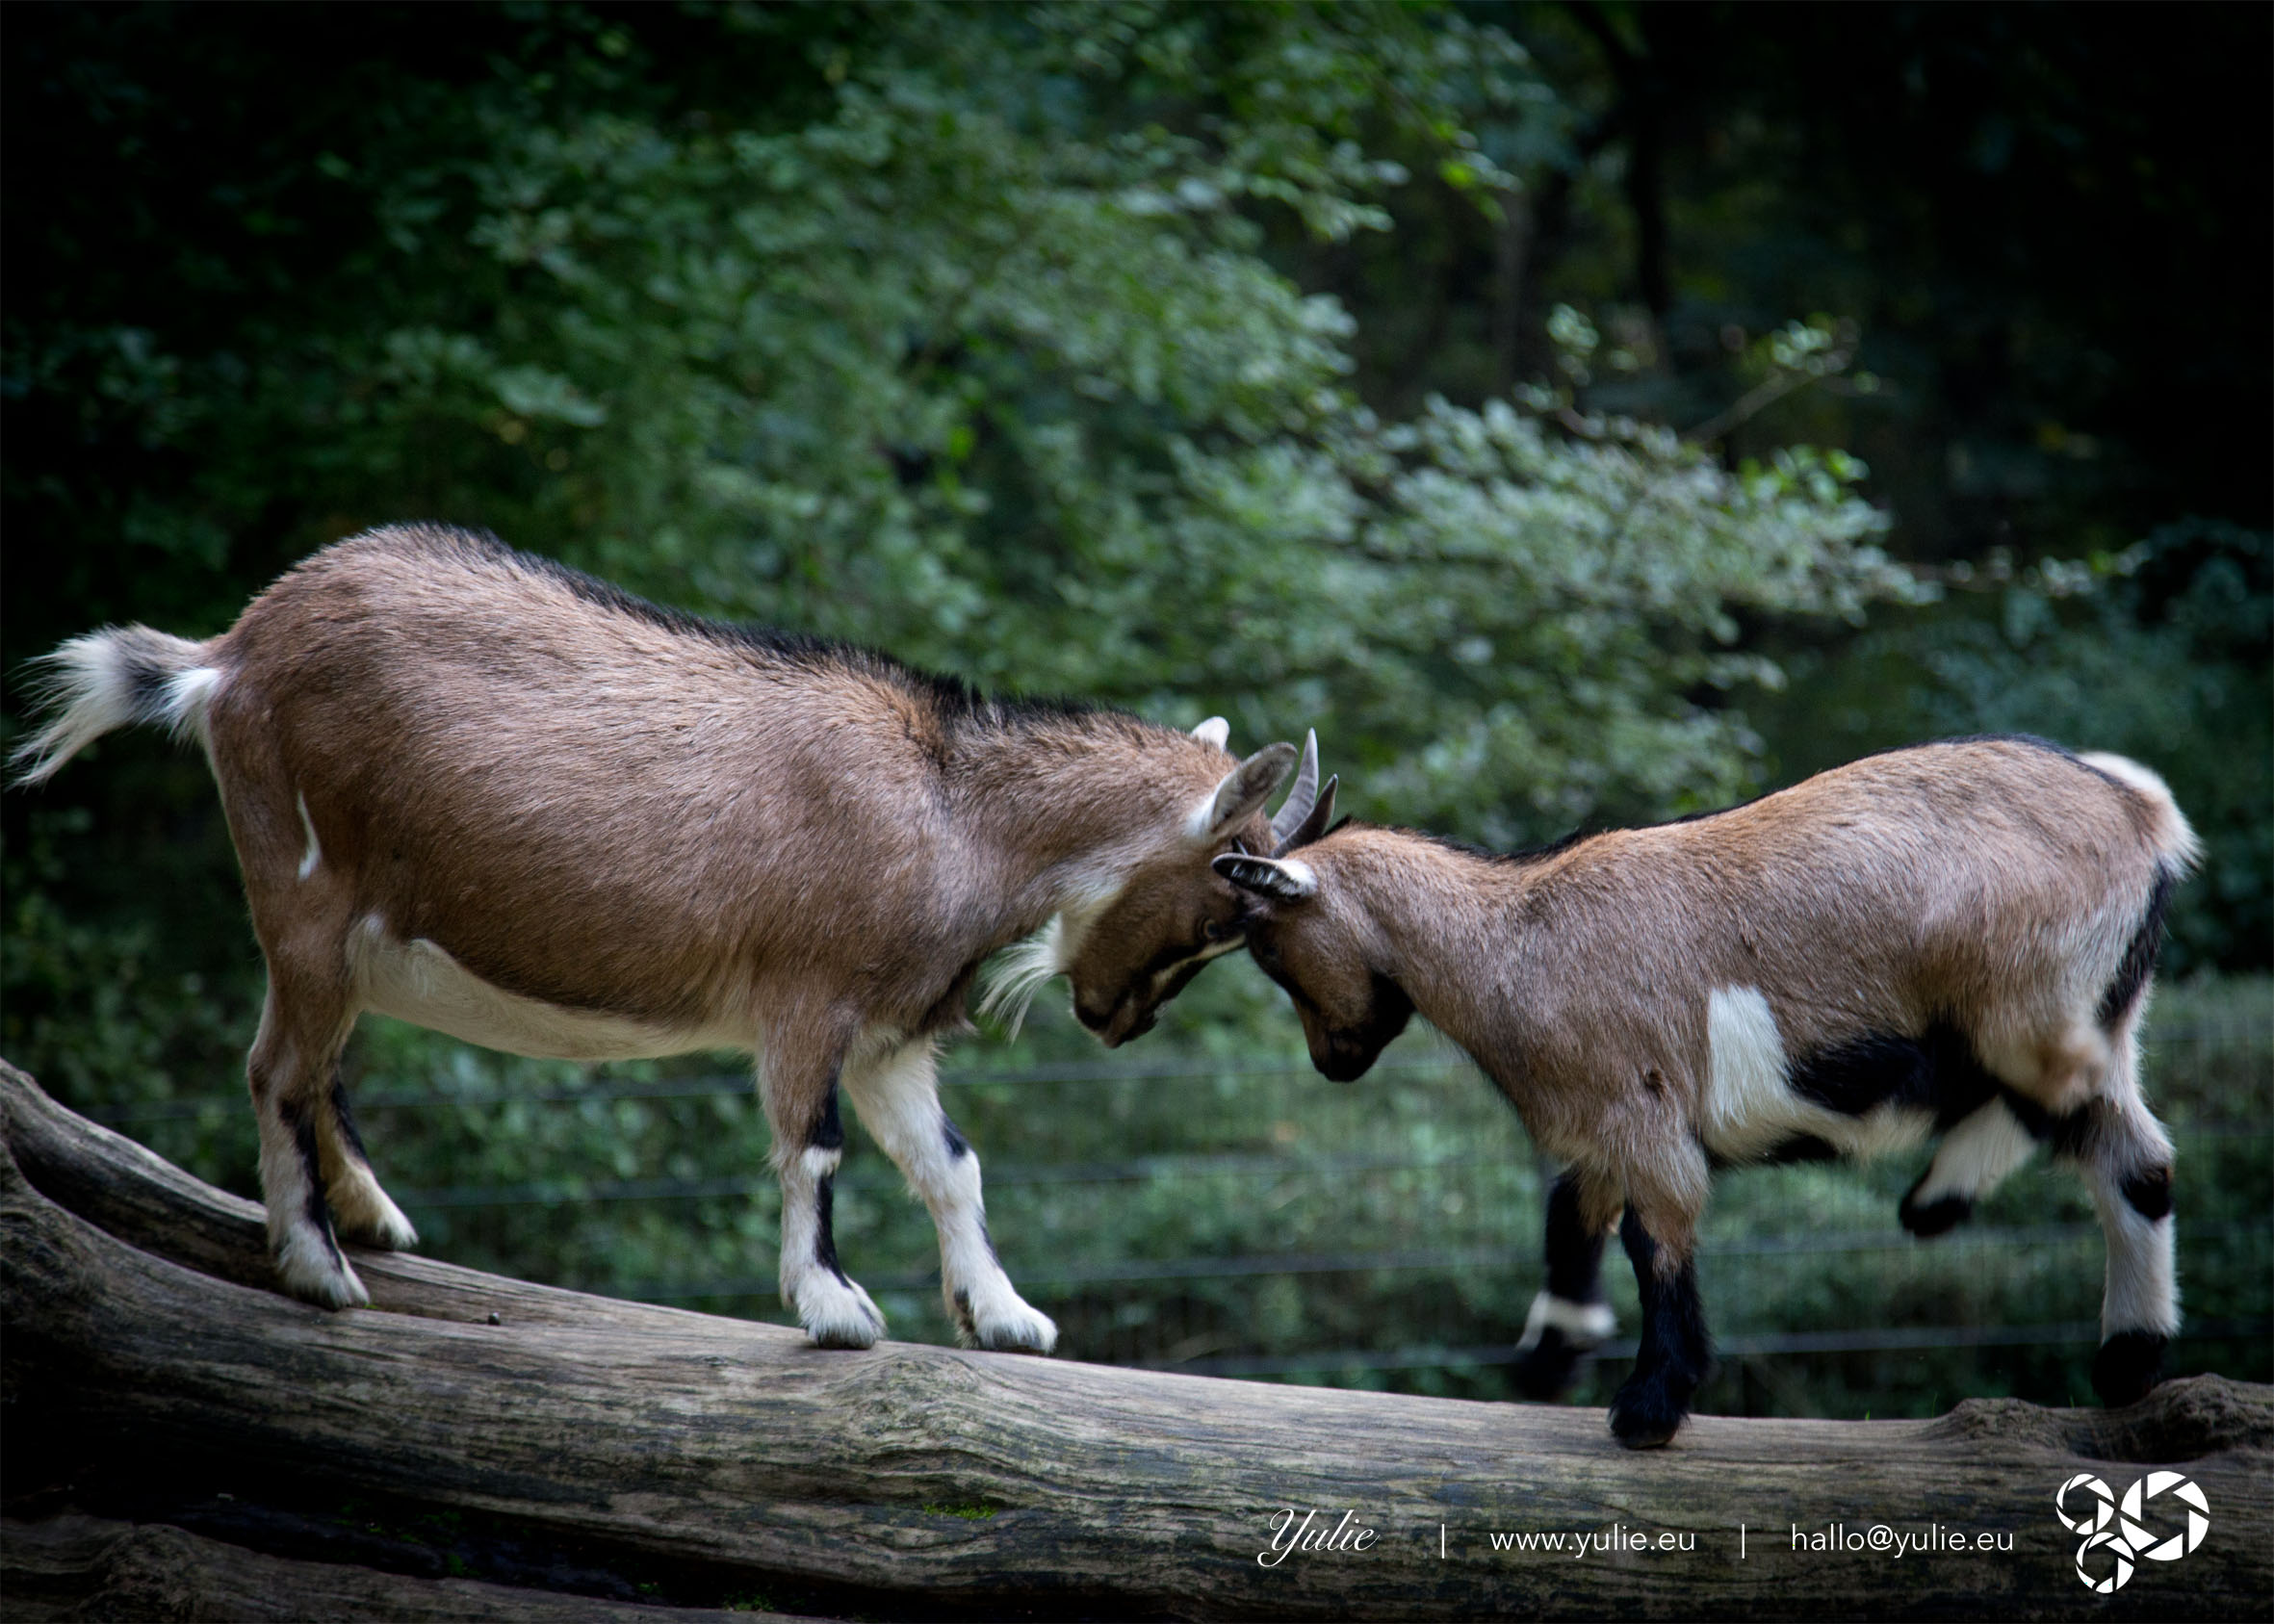 clashing horns